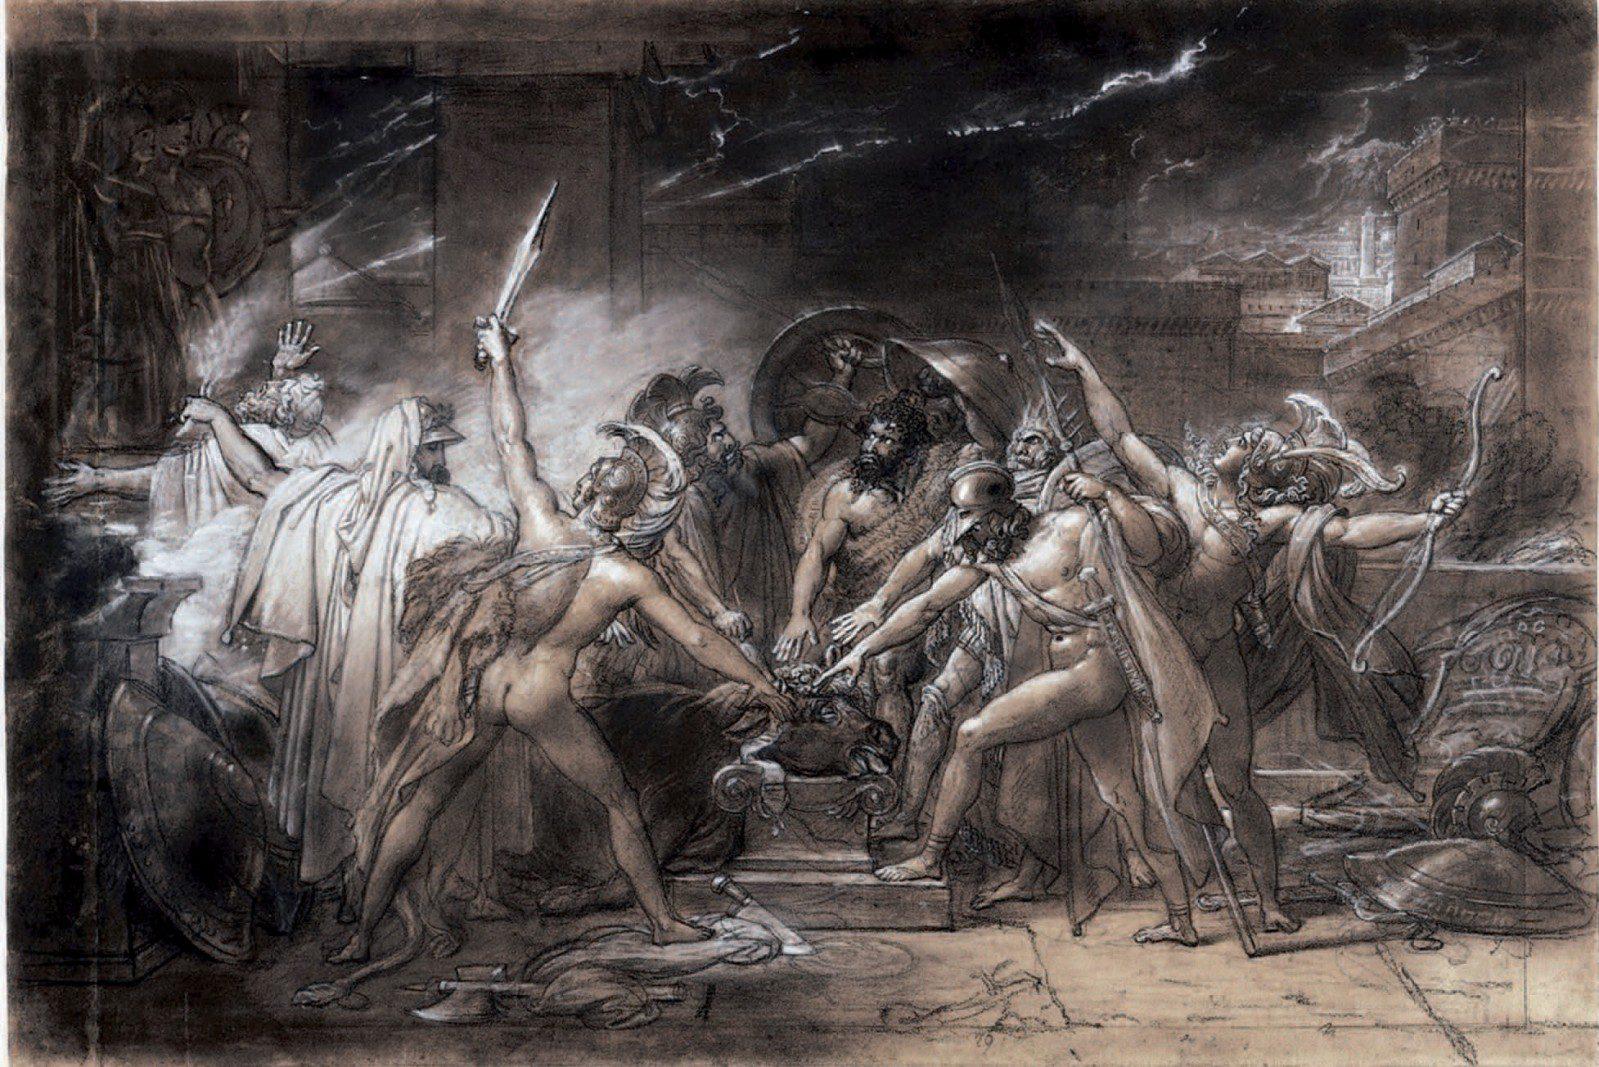 Le peintre Girodet